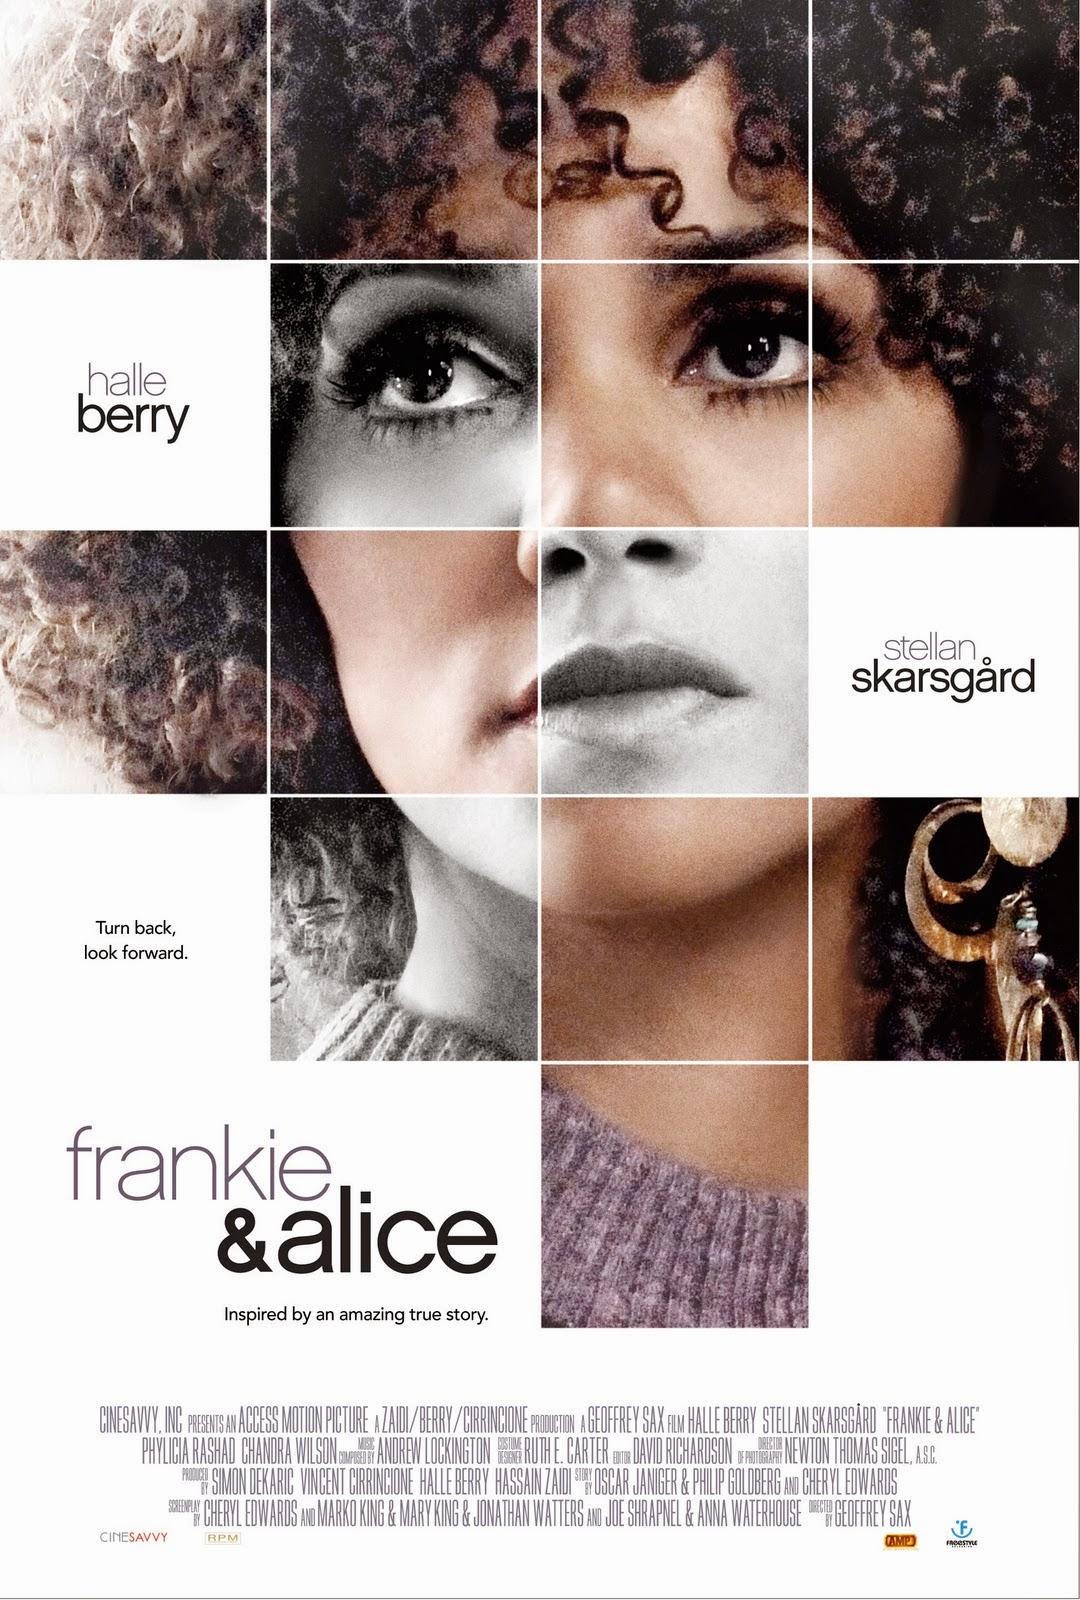 ... & Alice [2014] Movie Online Free Movie2k Putlocker viooz megashare